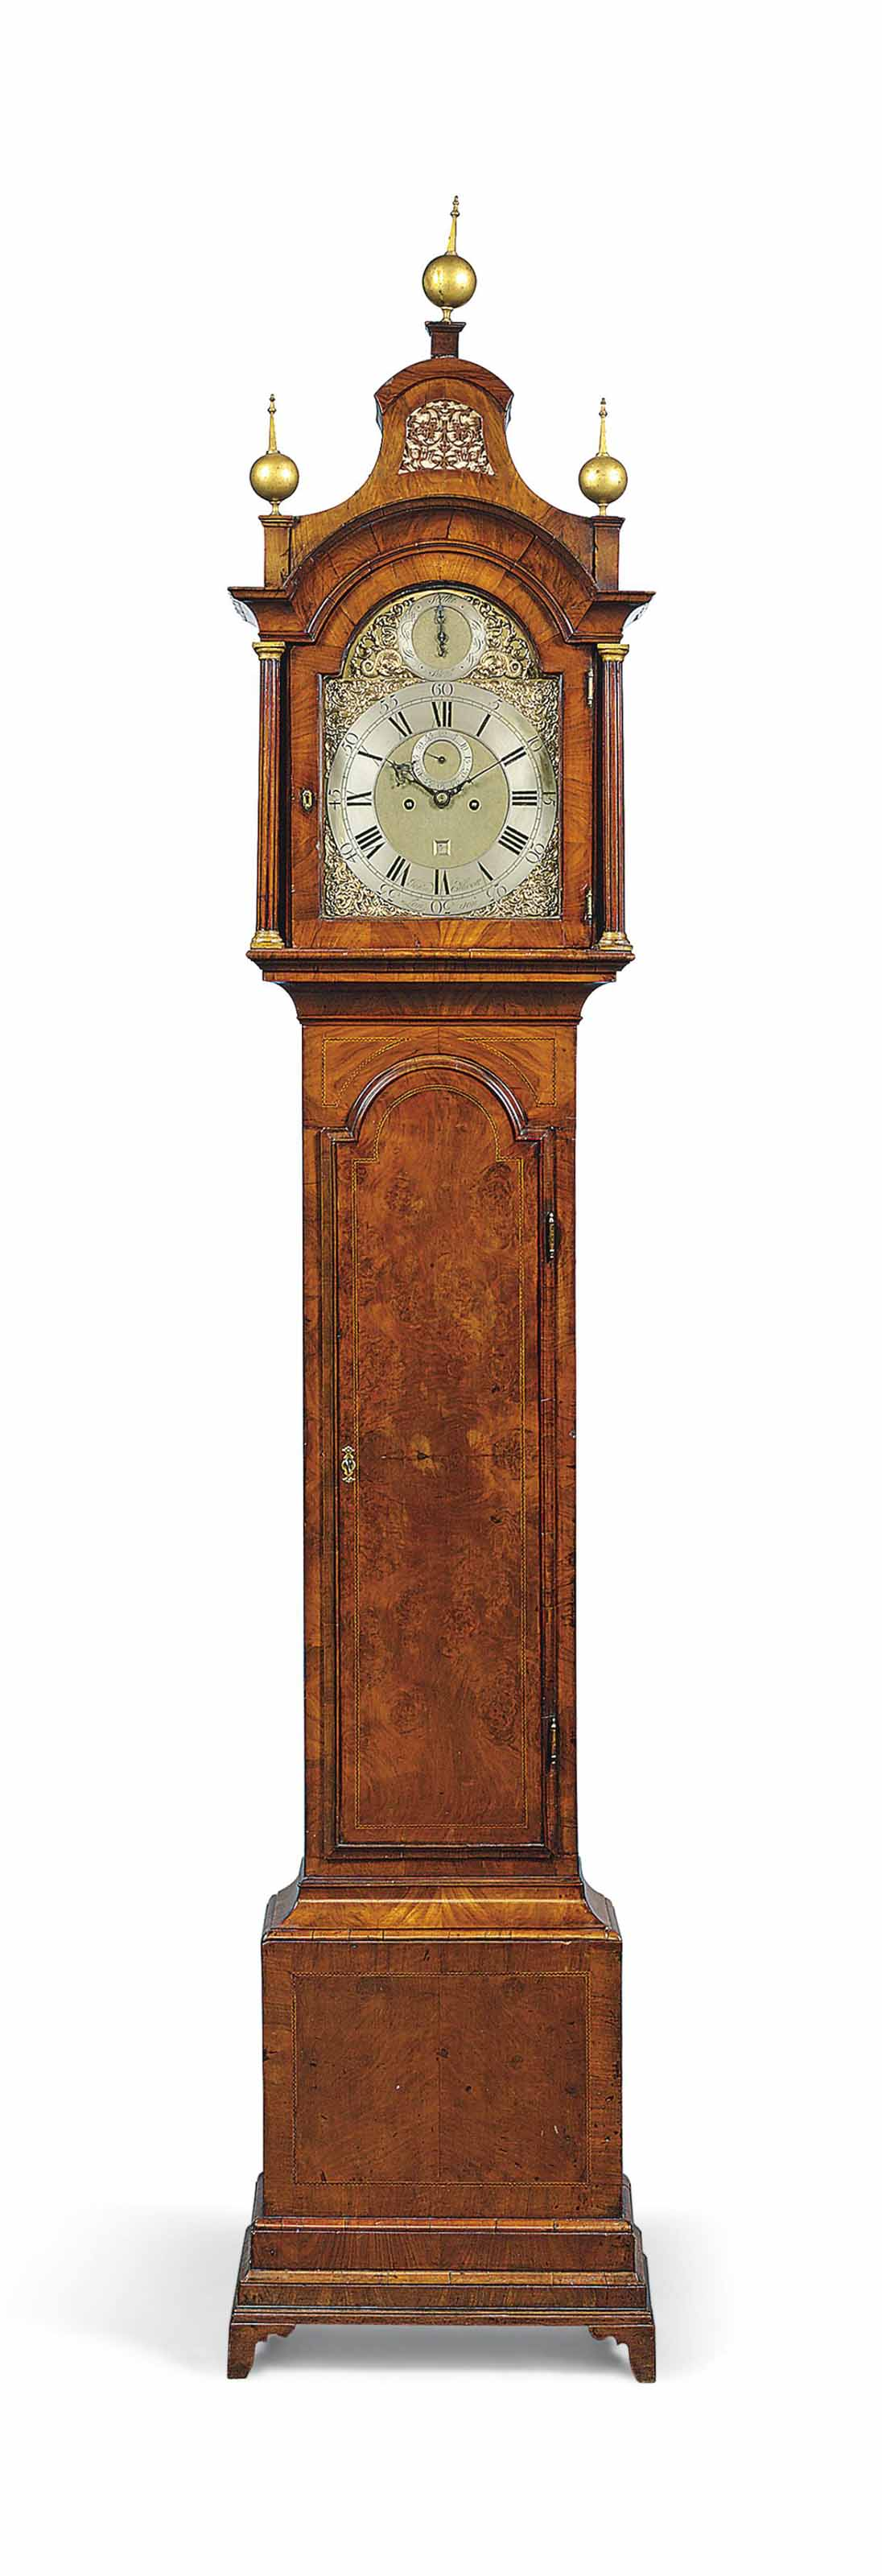 A GEORGE III MAHOGANY EIGHT-DAY STRIKING LONGCASE CLOCK